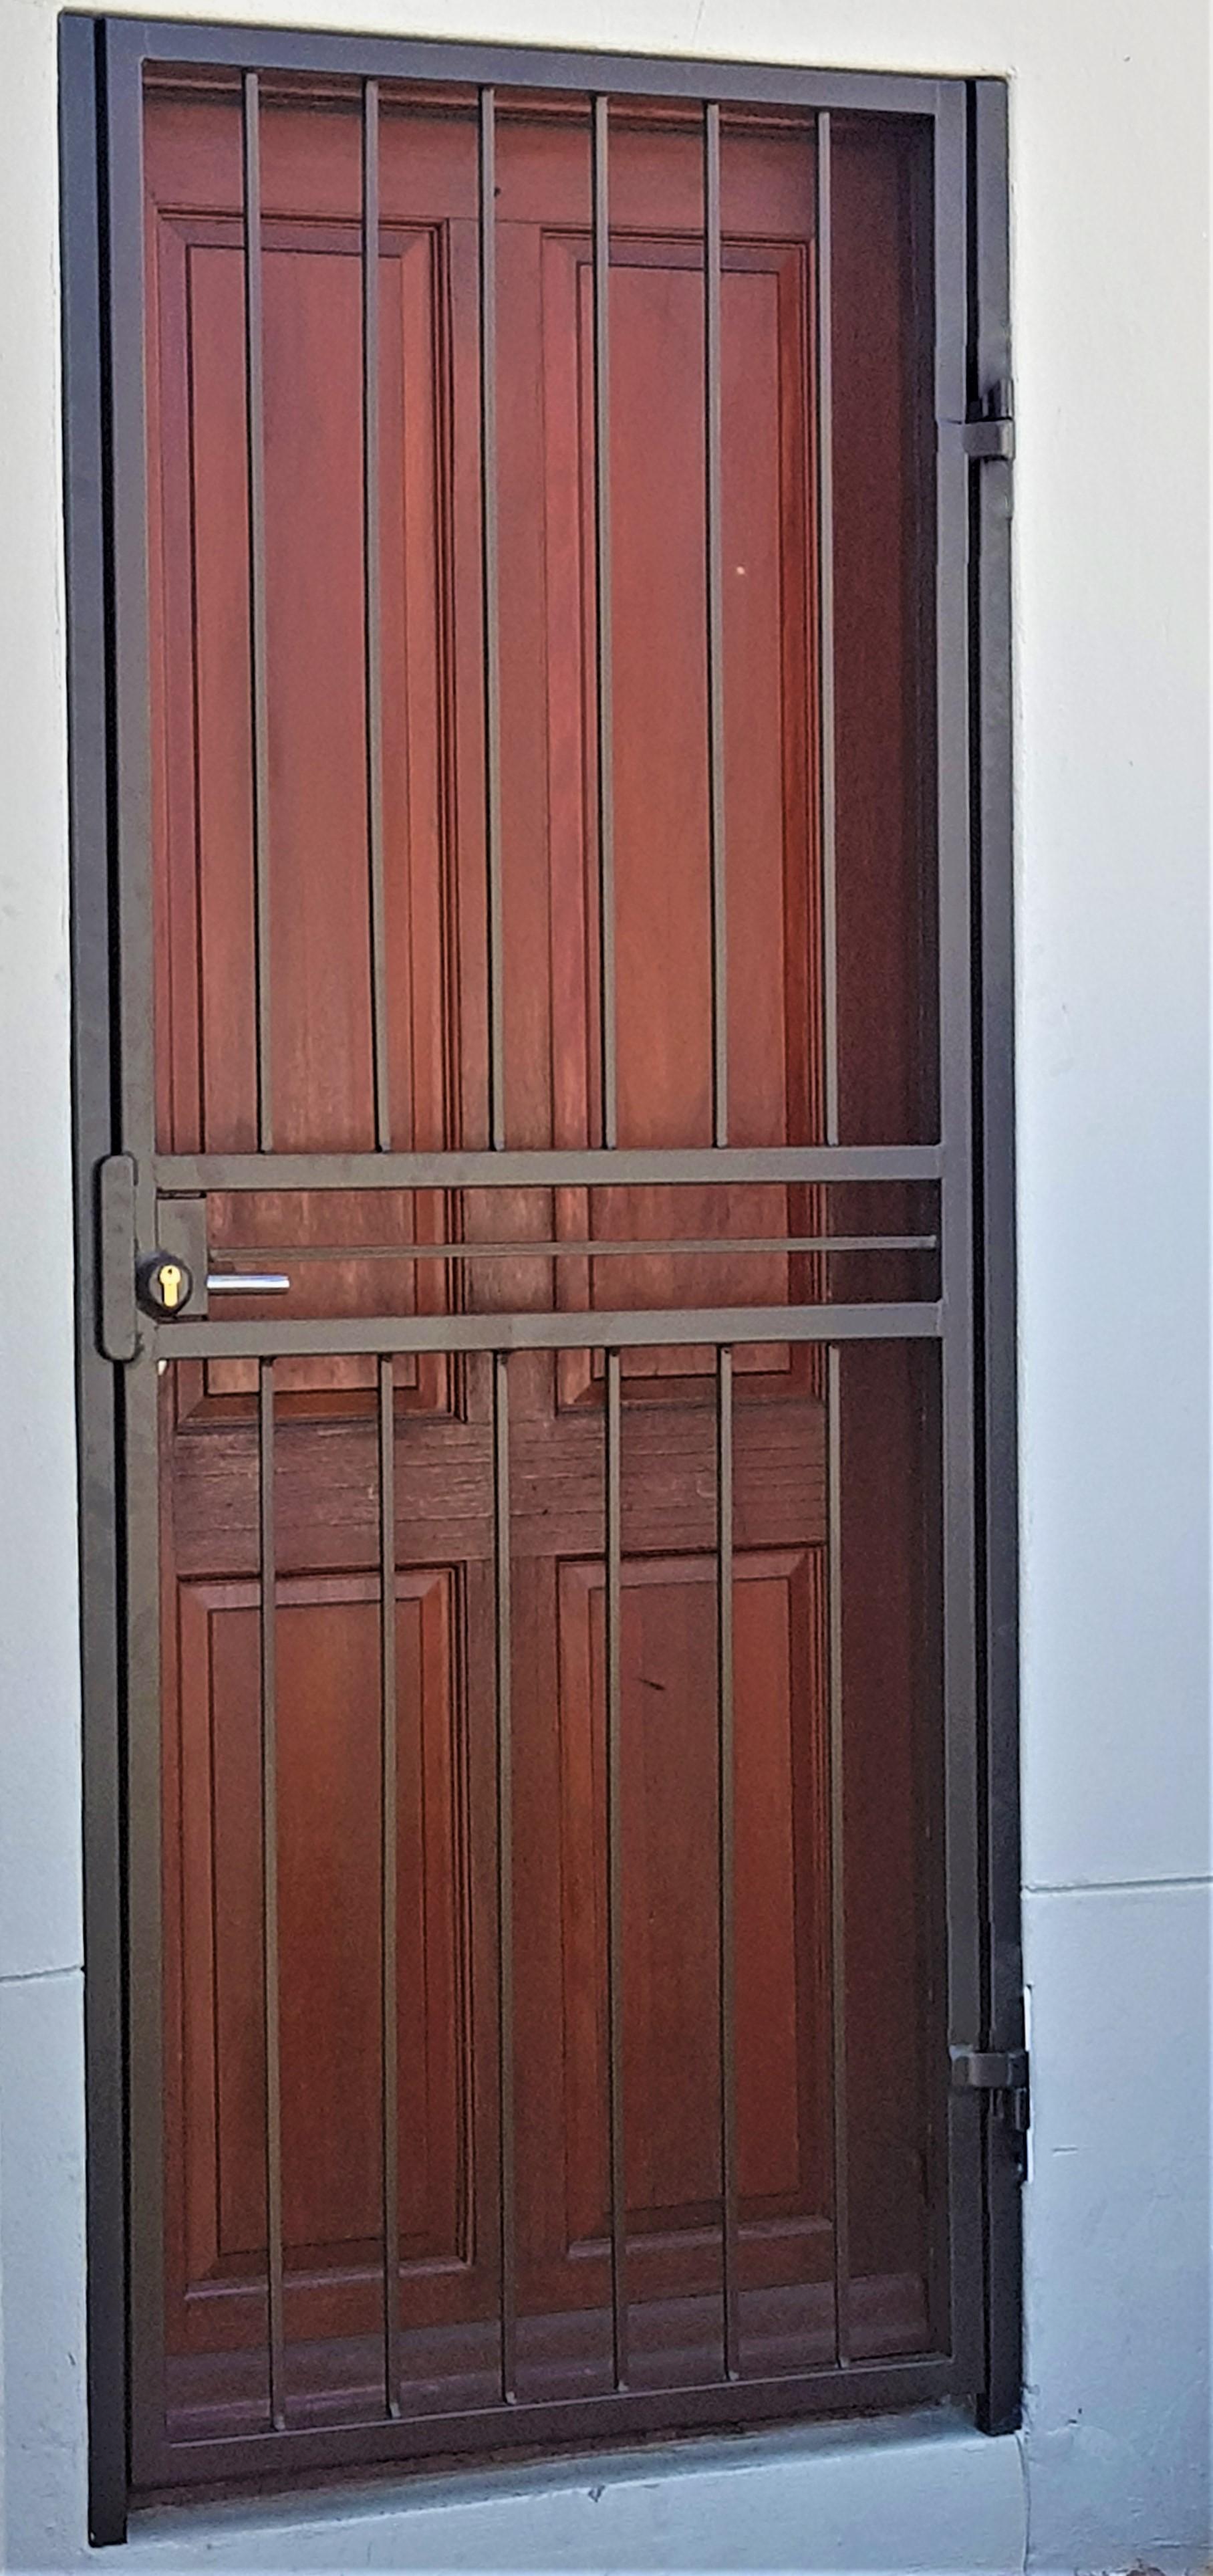 Security gate7